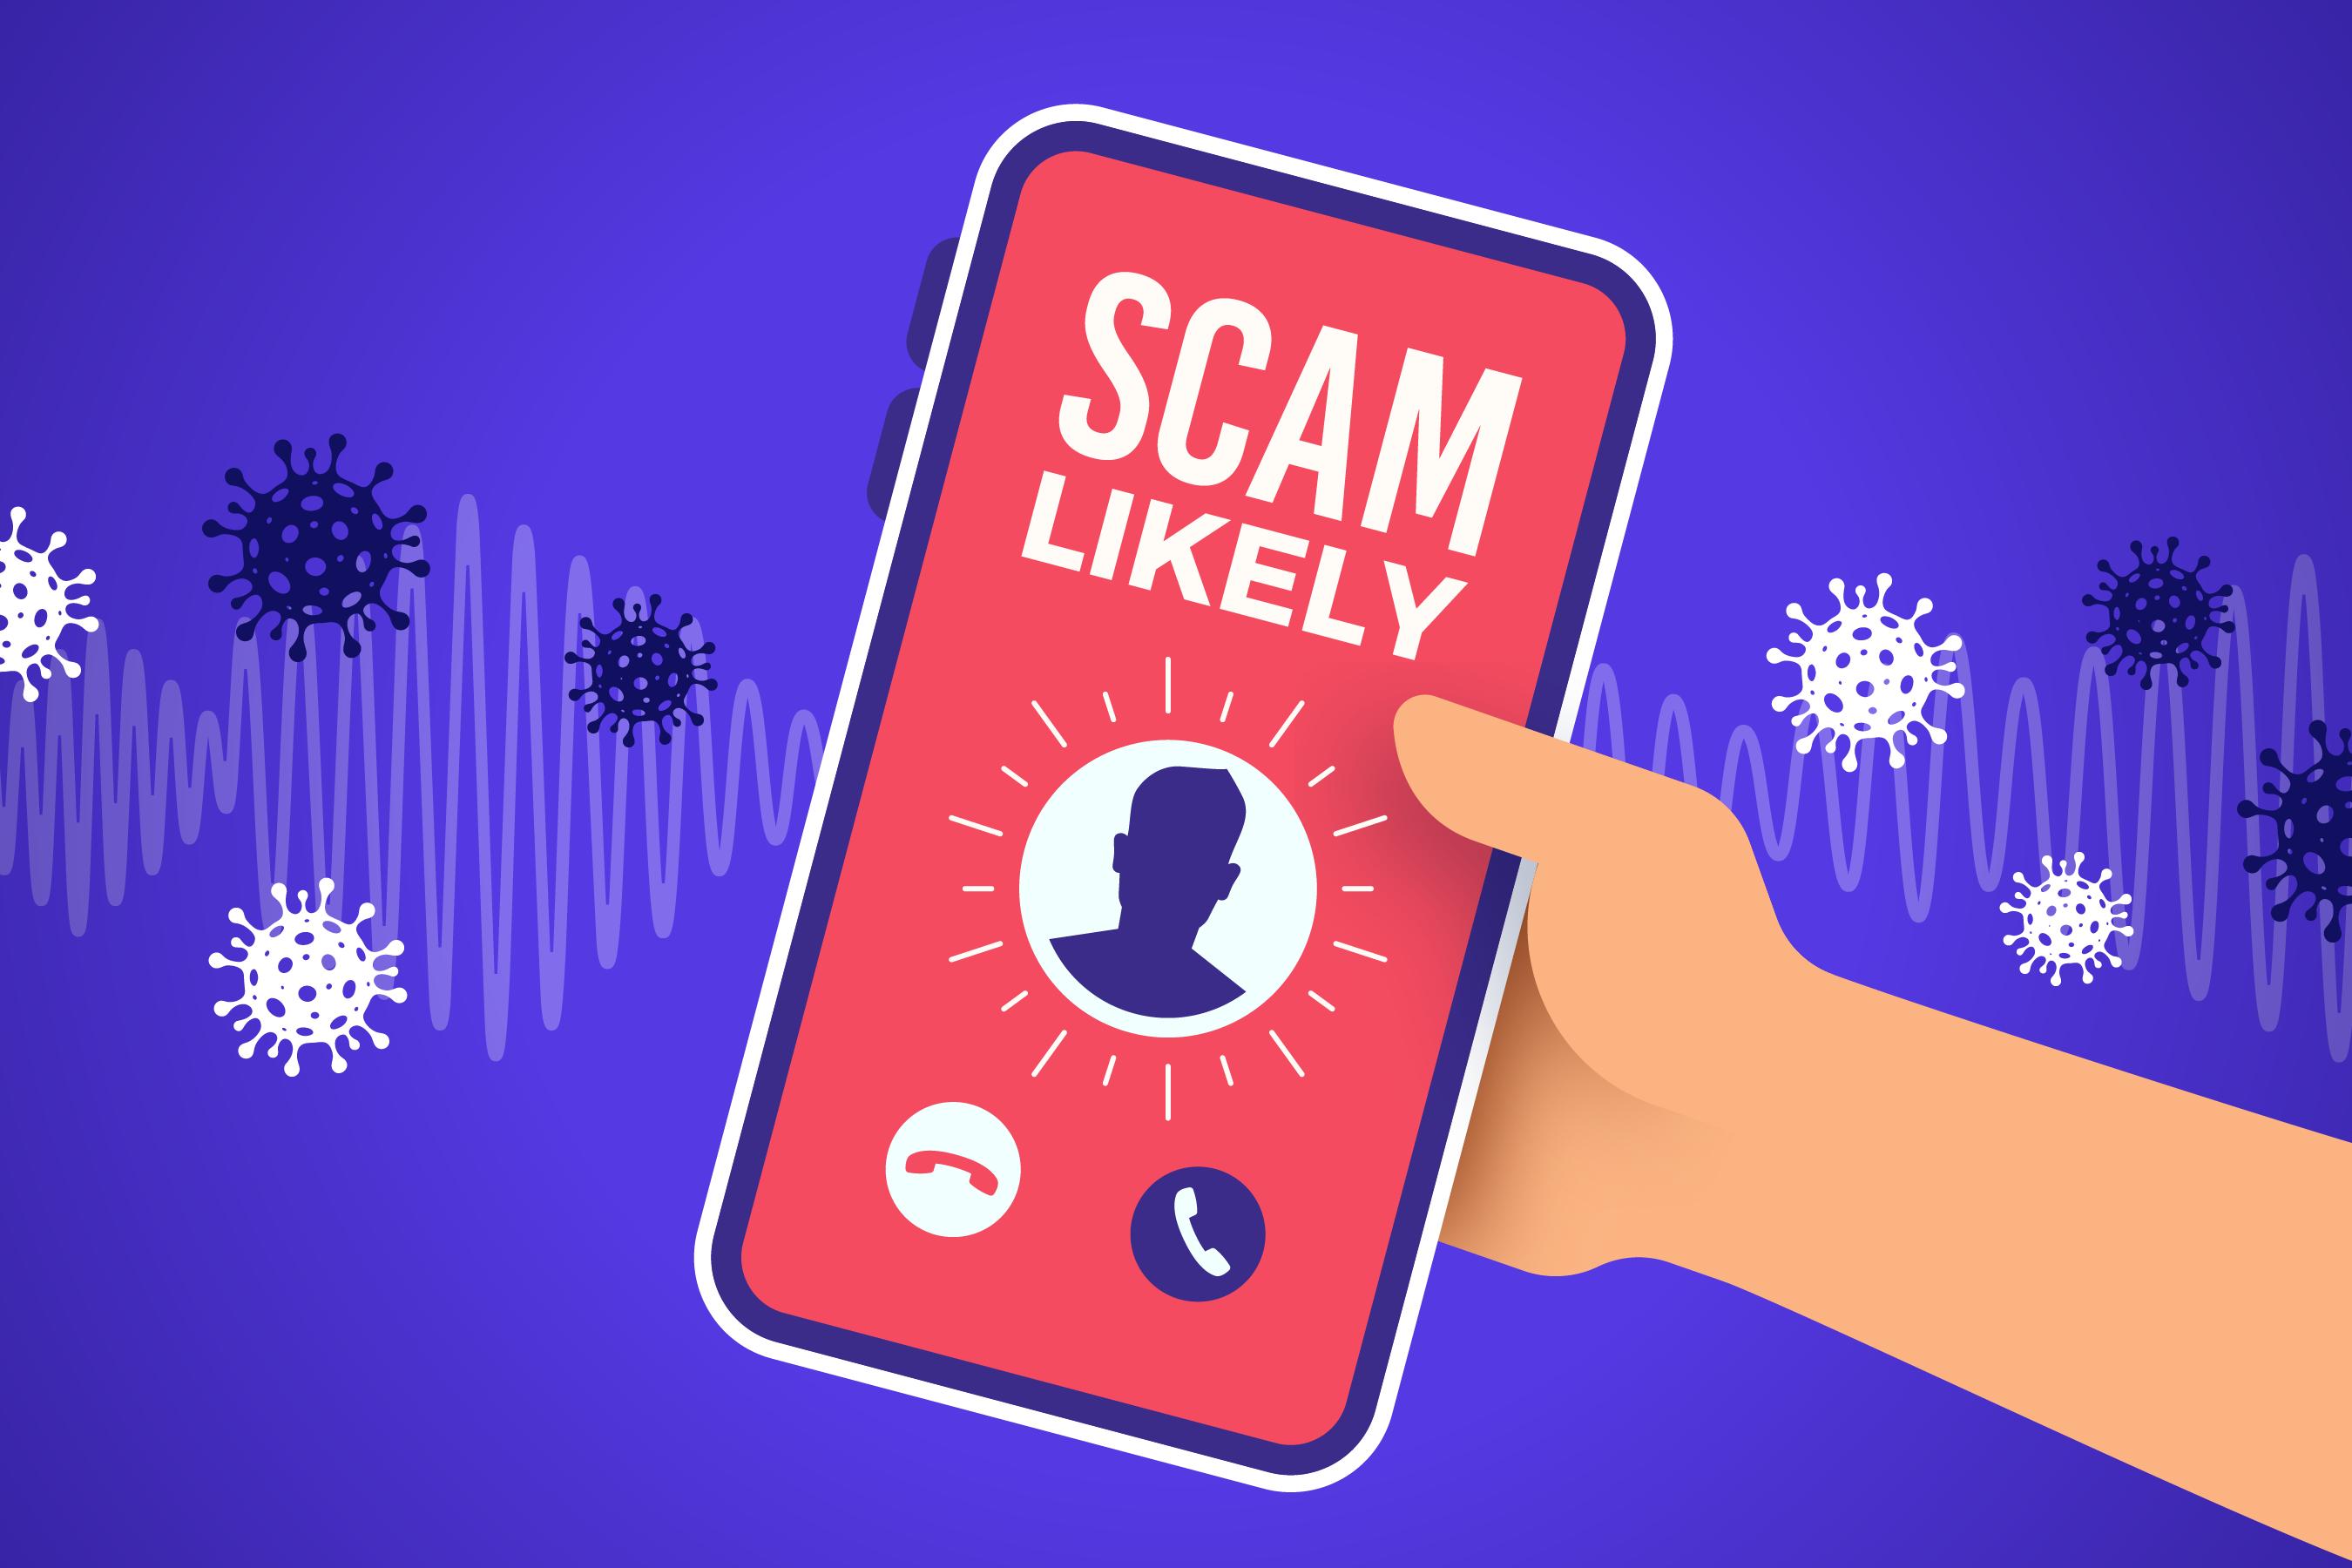 Alerta por fraude: cosas que un rastreador de contactos de COVID nunca preguntaría thumbnail